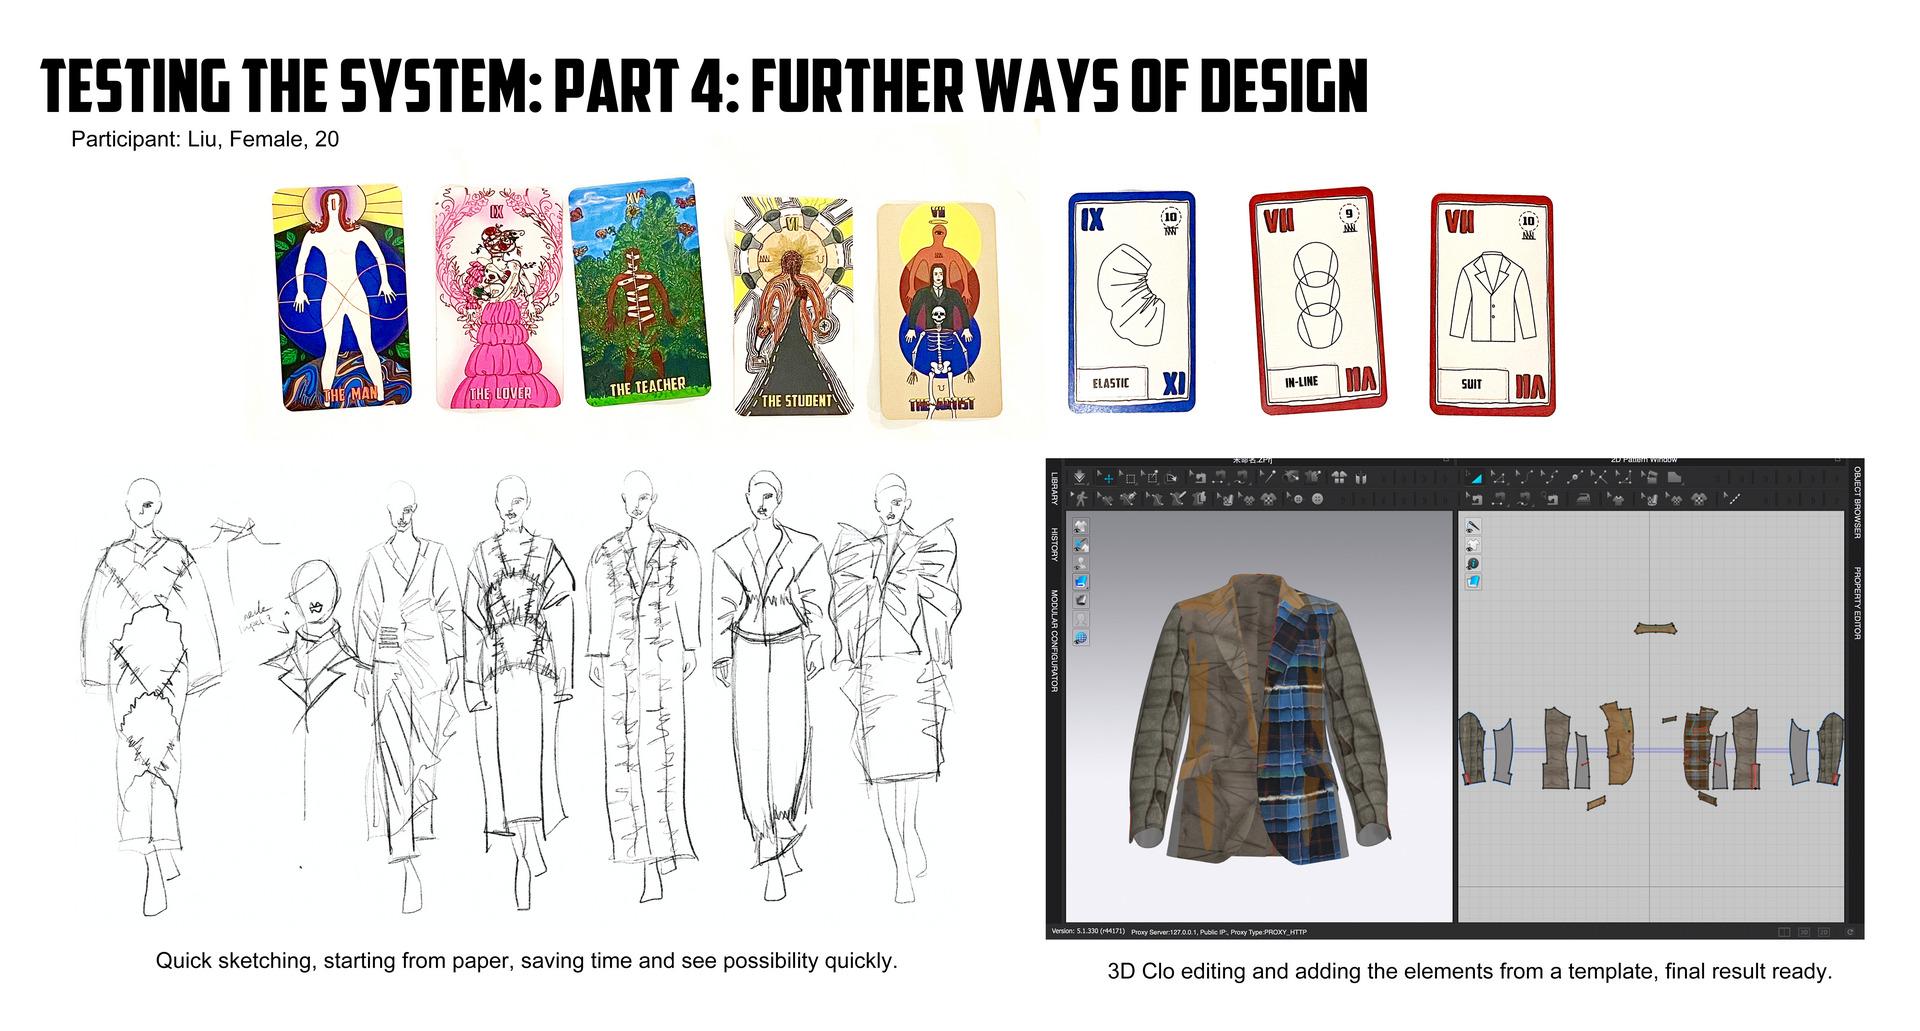 Further Ways Of Design